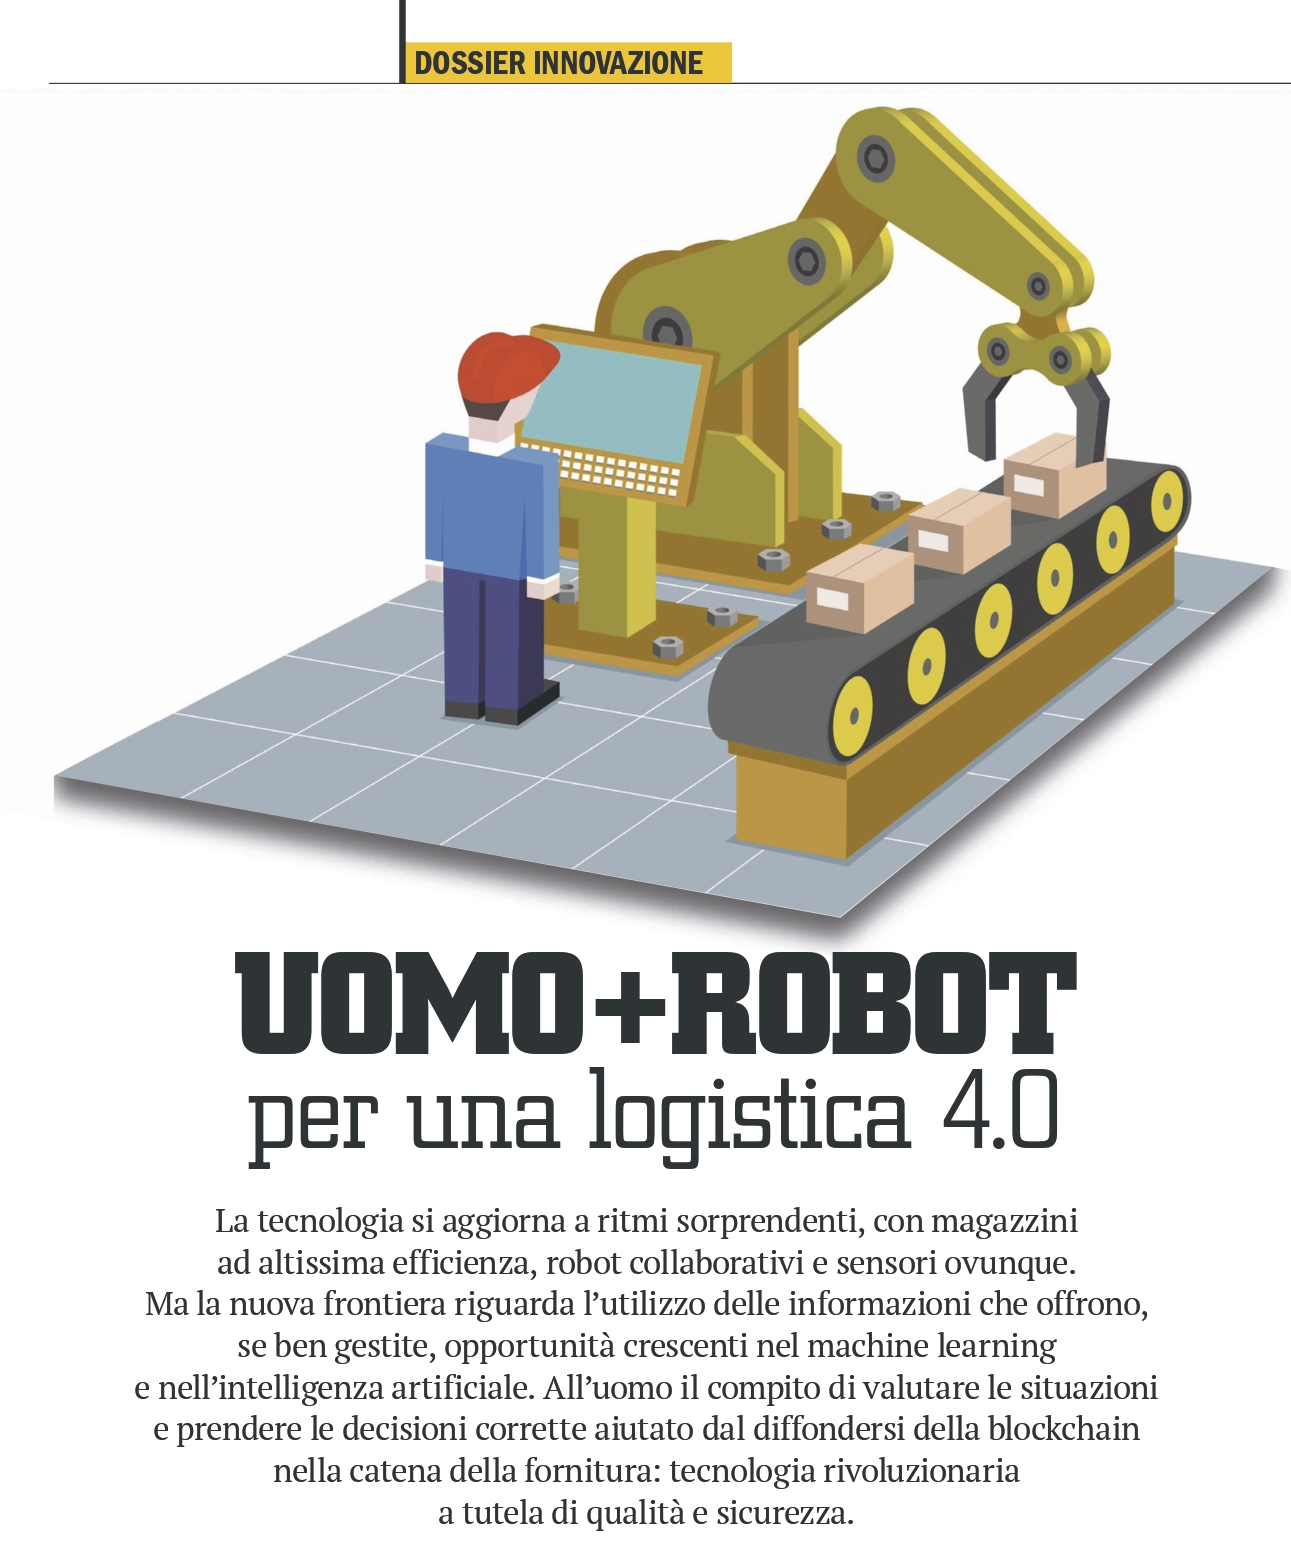 dossier uomo+robot